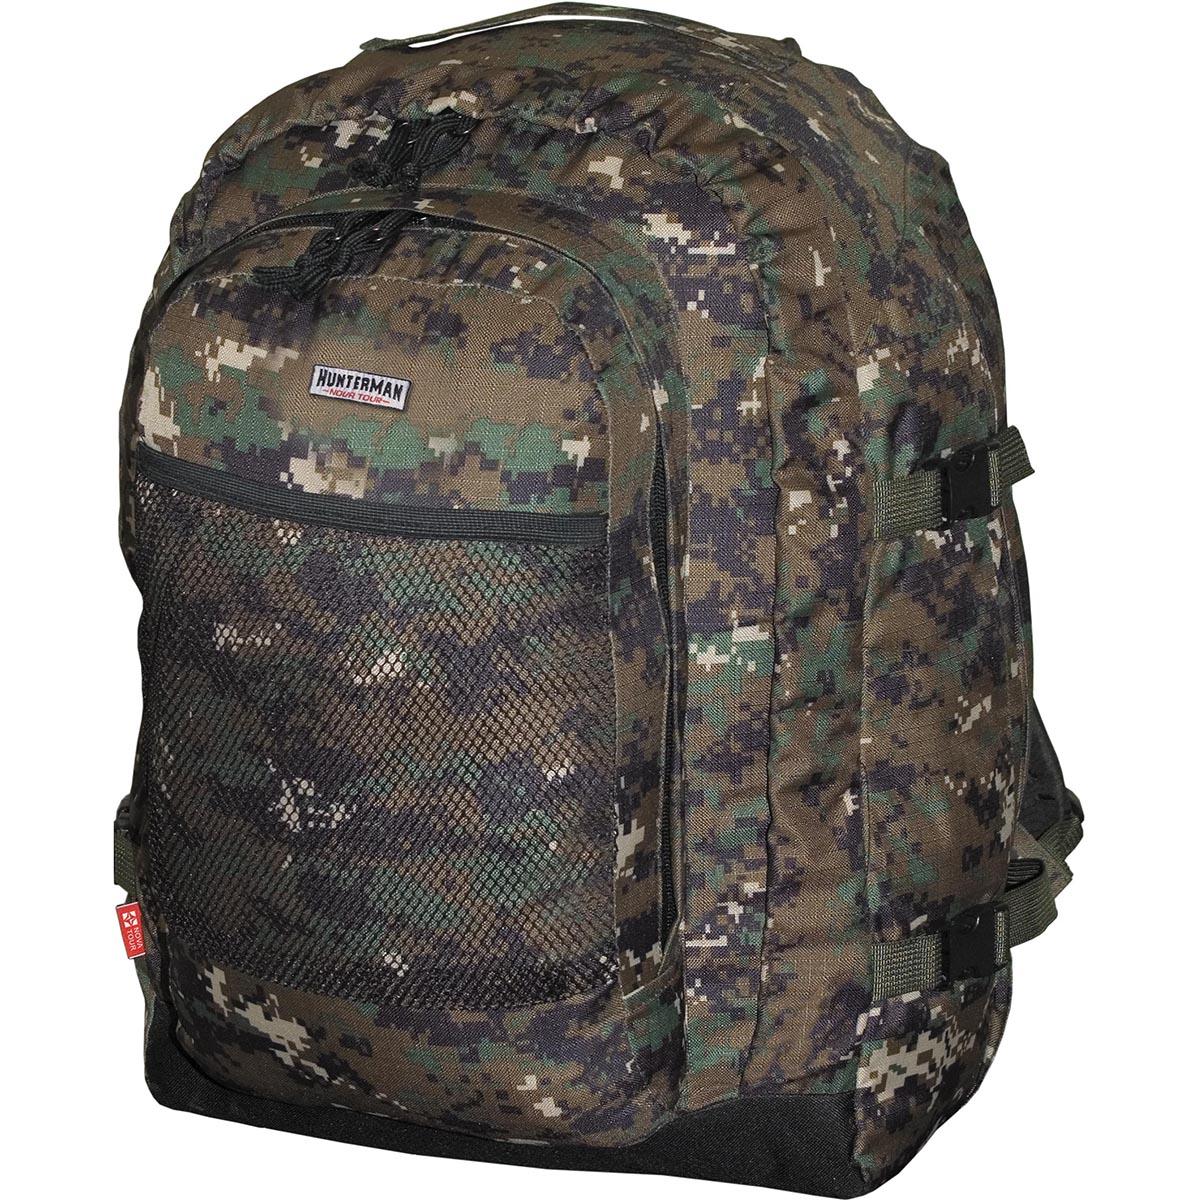 Рюкзак для охоты HunterMan Nova Tour  Бекас 55 V3 , цвет: темно-зеленый, 55 л - Охота